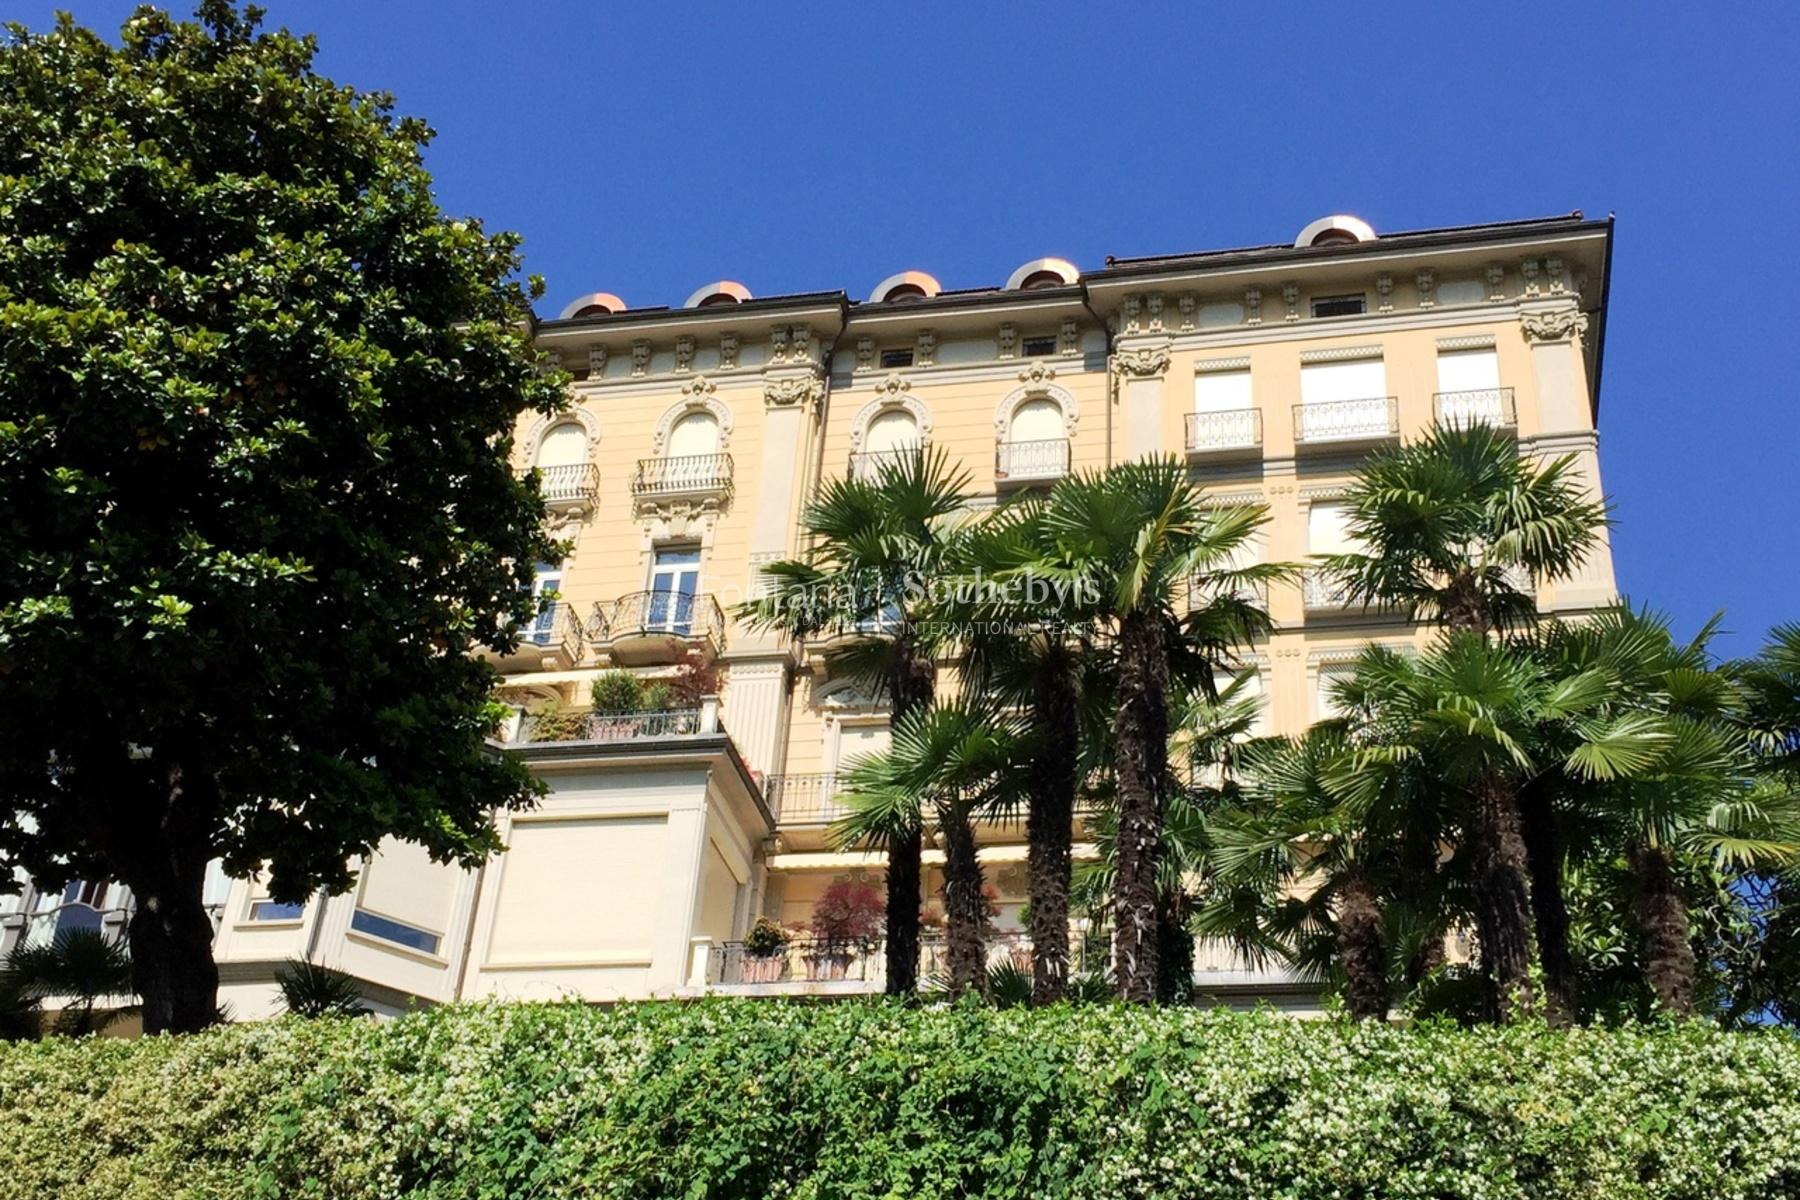 Apartment for Sale at Prestigious duplex penthouse Lugano Lugano, Ticino, 6900 Switzerland